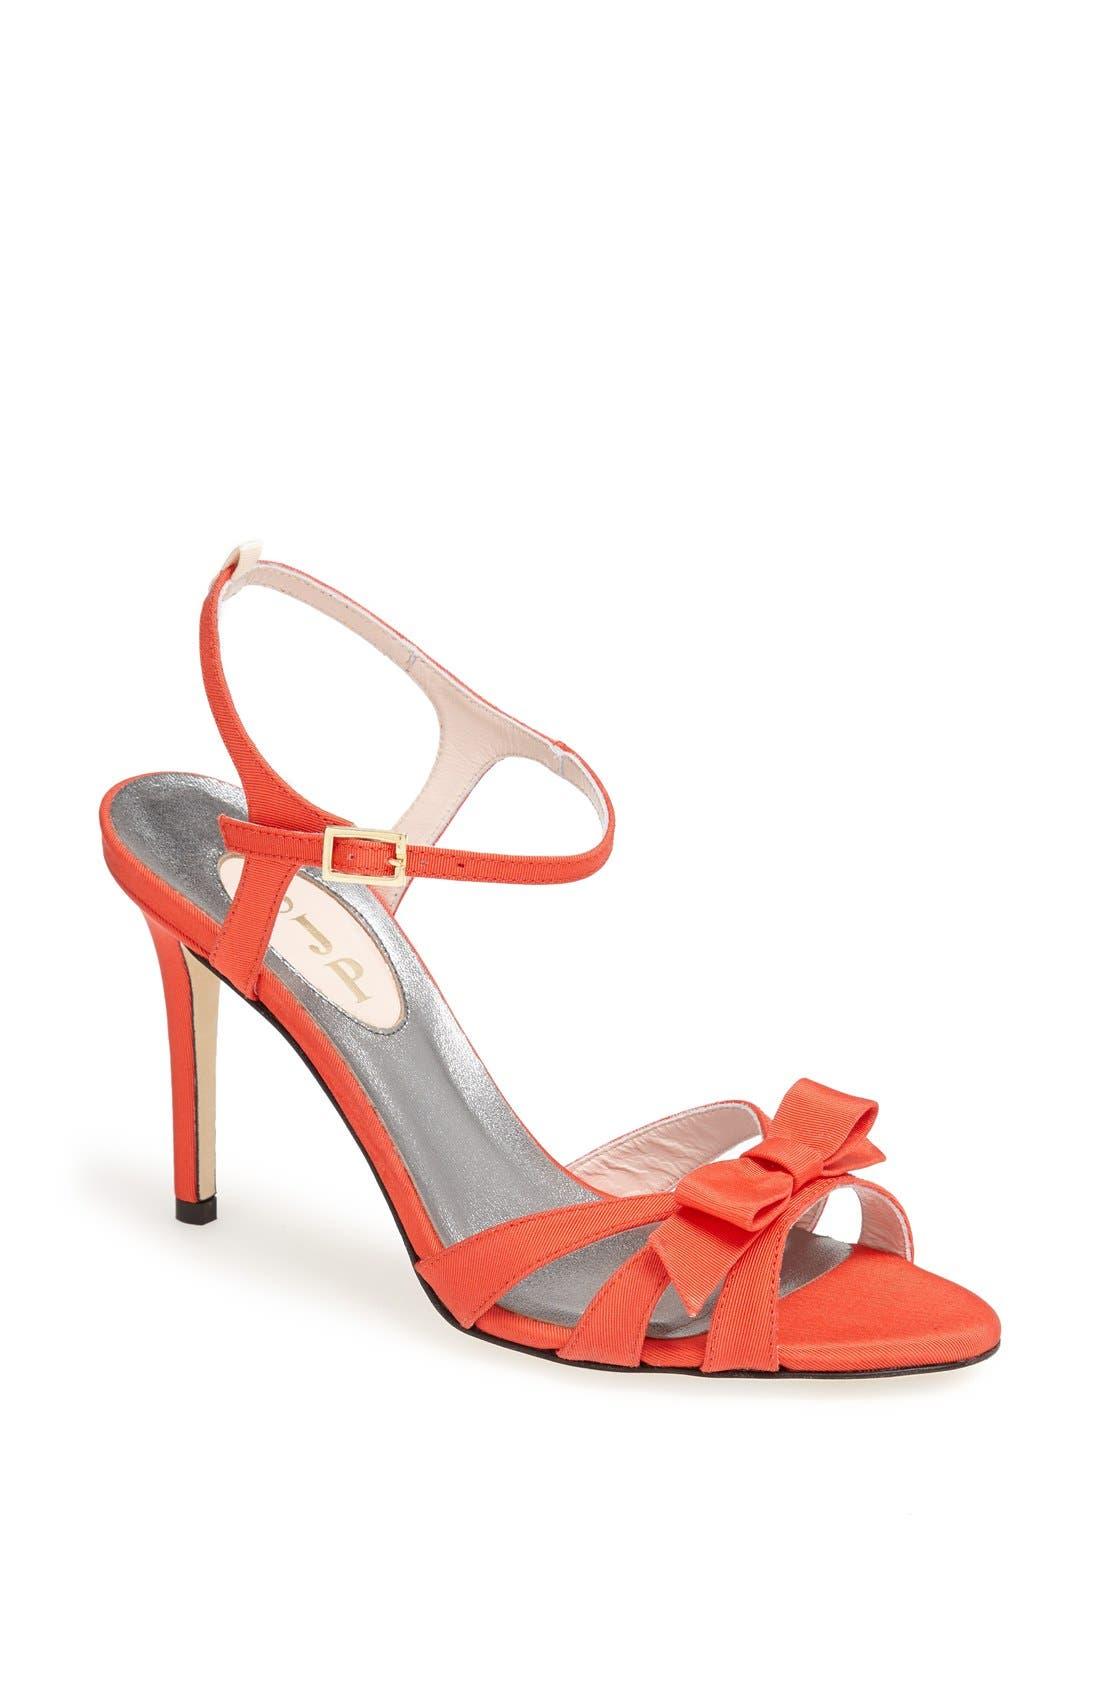 Alternate Image 1 Selected - SJP 'Silvia' Grosgrain Ankle Strap Sandal (Nordstrom Exclusive)